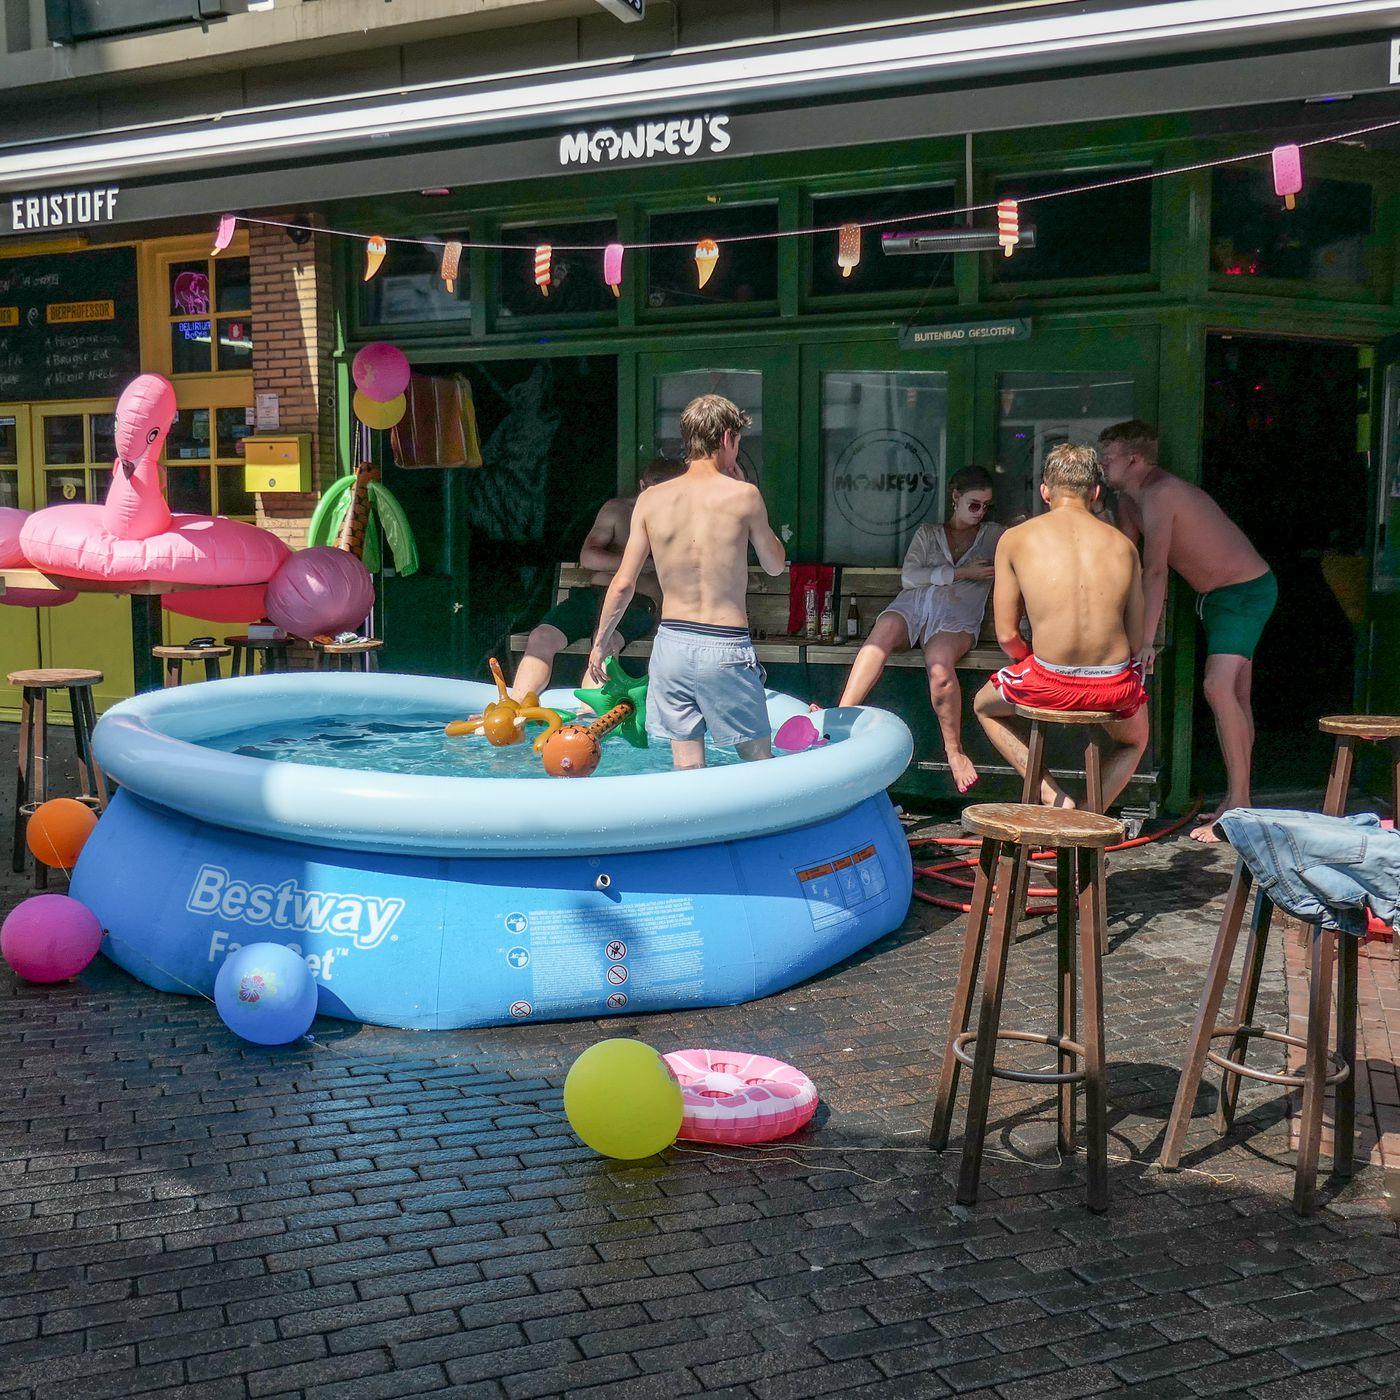 Europe heat wave 2019: France, Germany, UK, Netherlands, and Belgium set  records - Vox